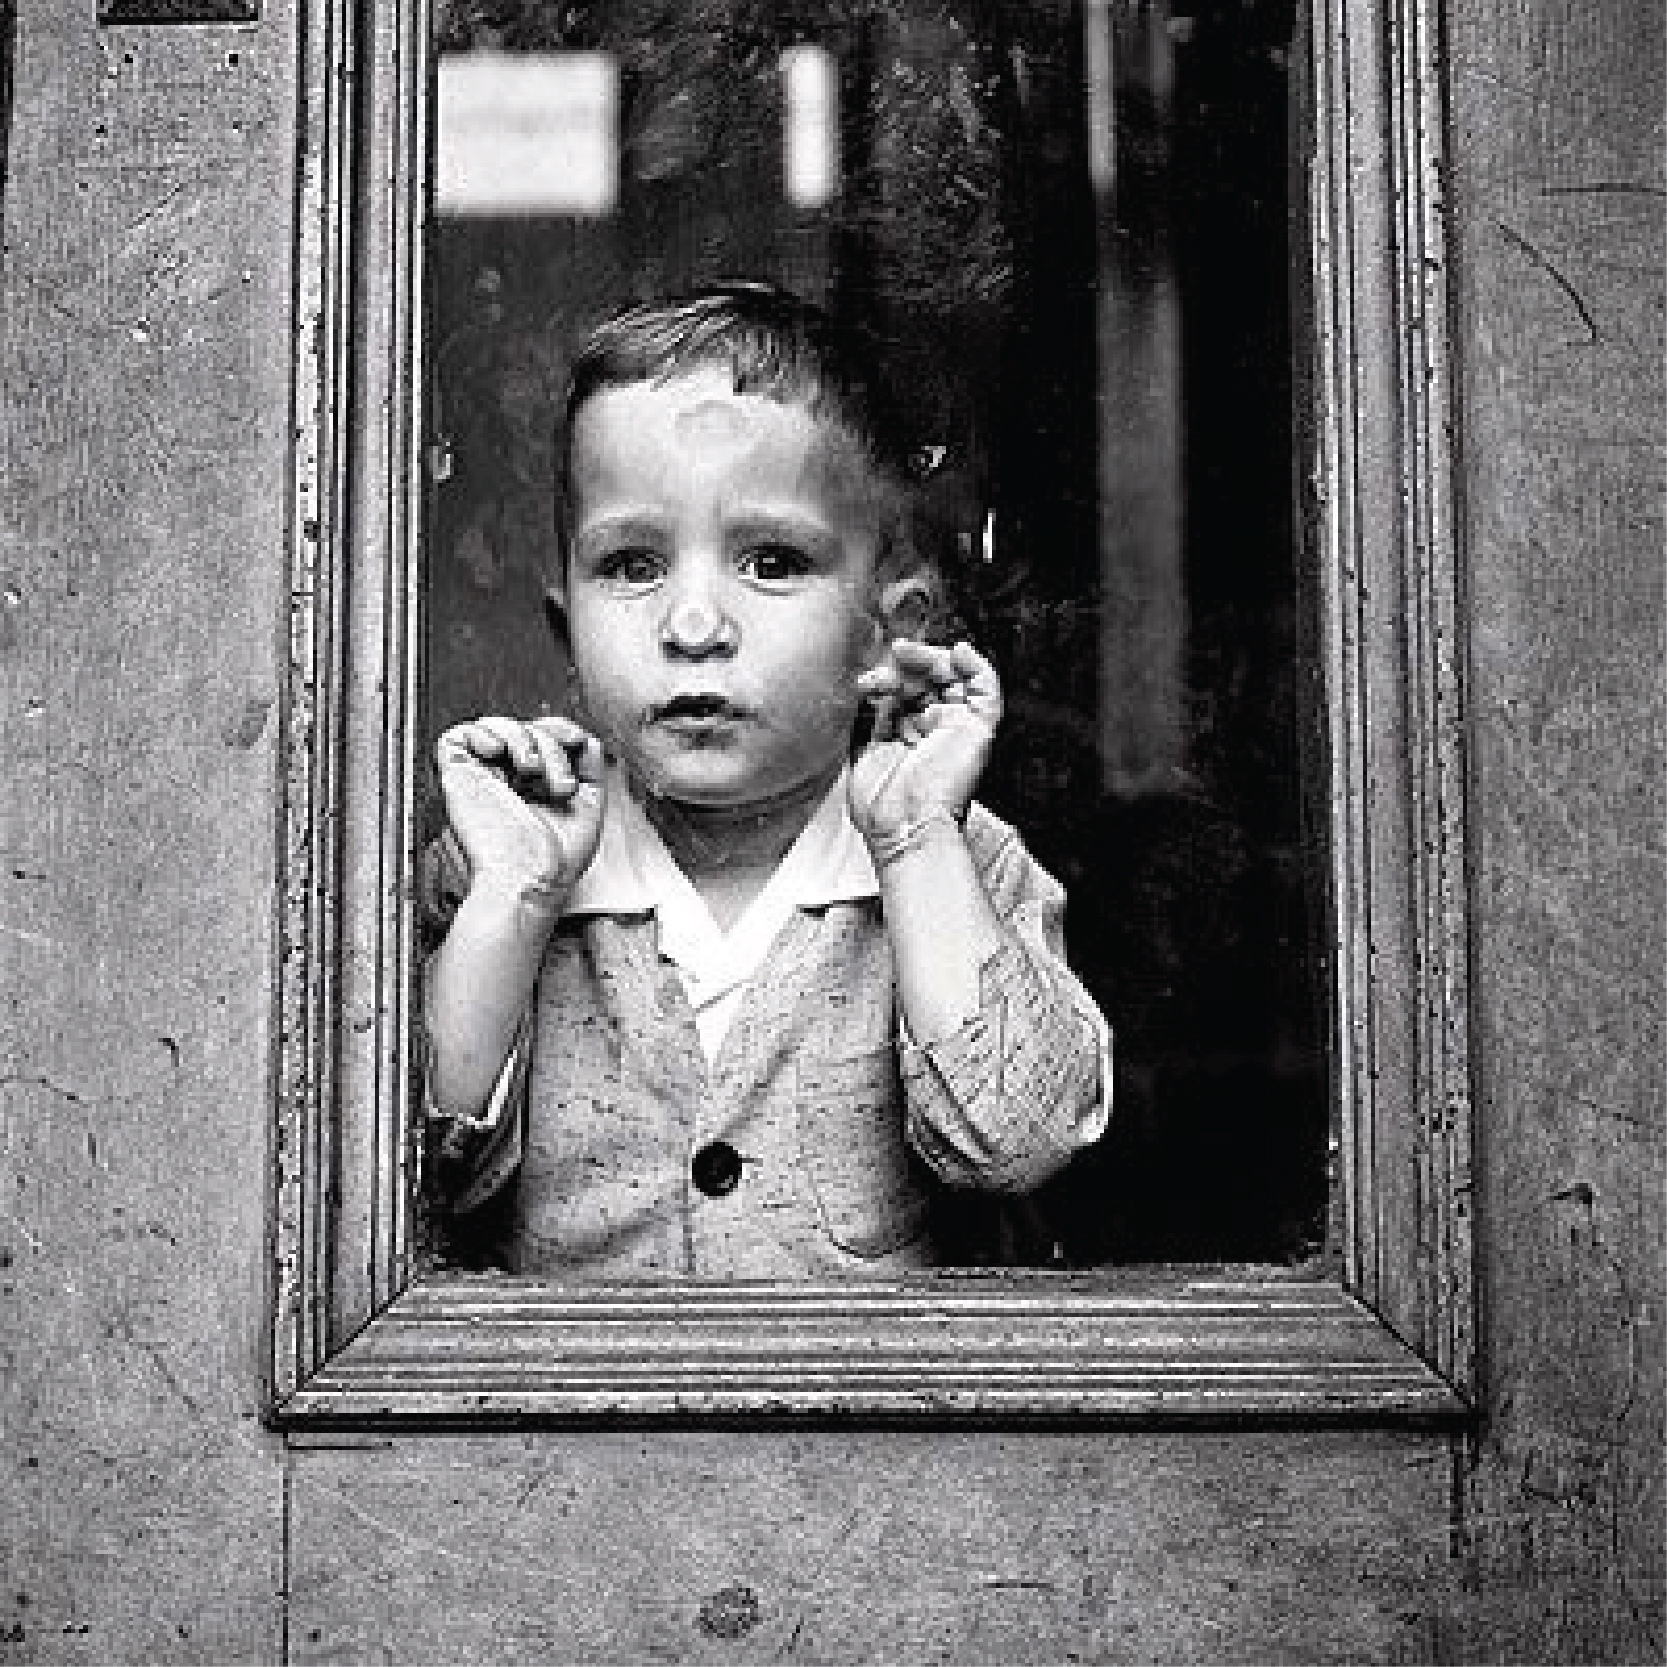 May 5, 1955 New York, NY by Vivian Maier